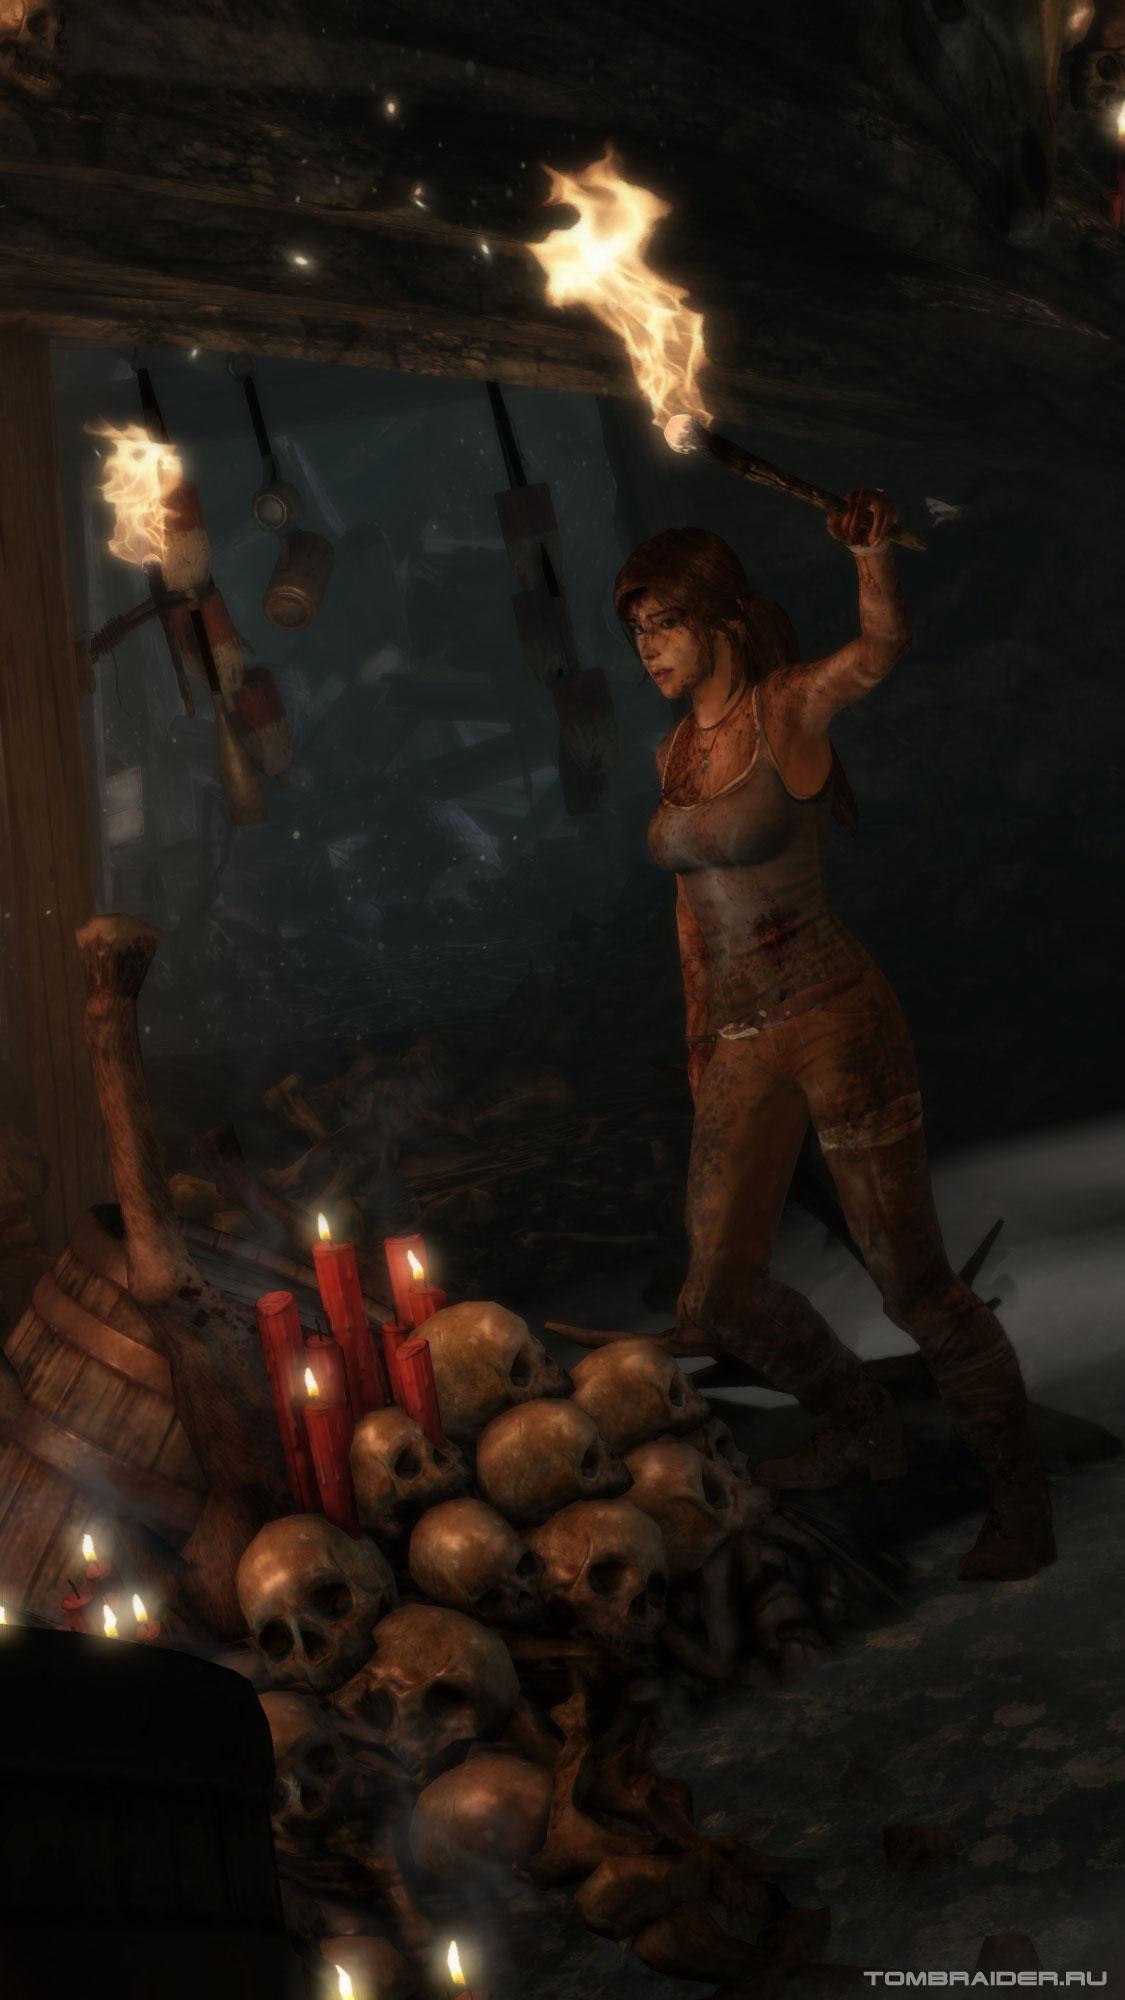 Tomb Raider 2013 моды для PC